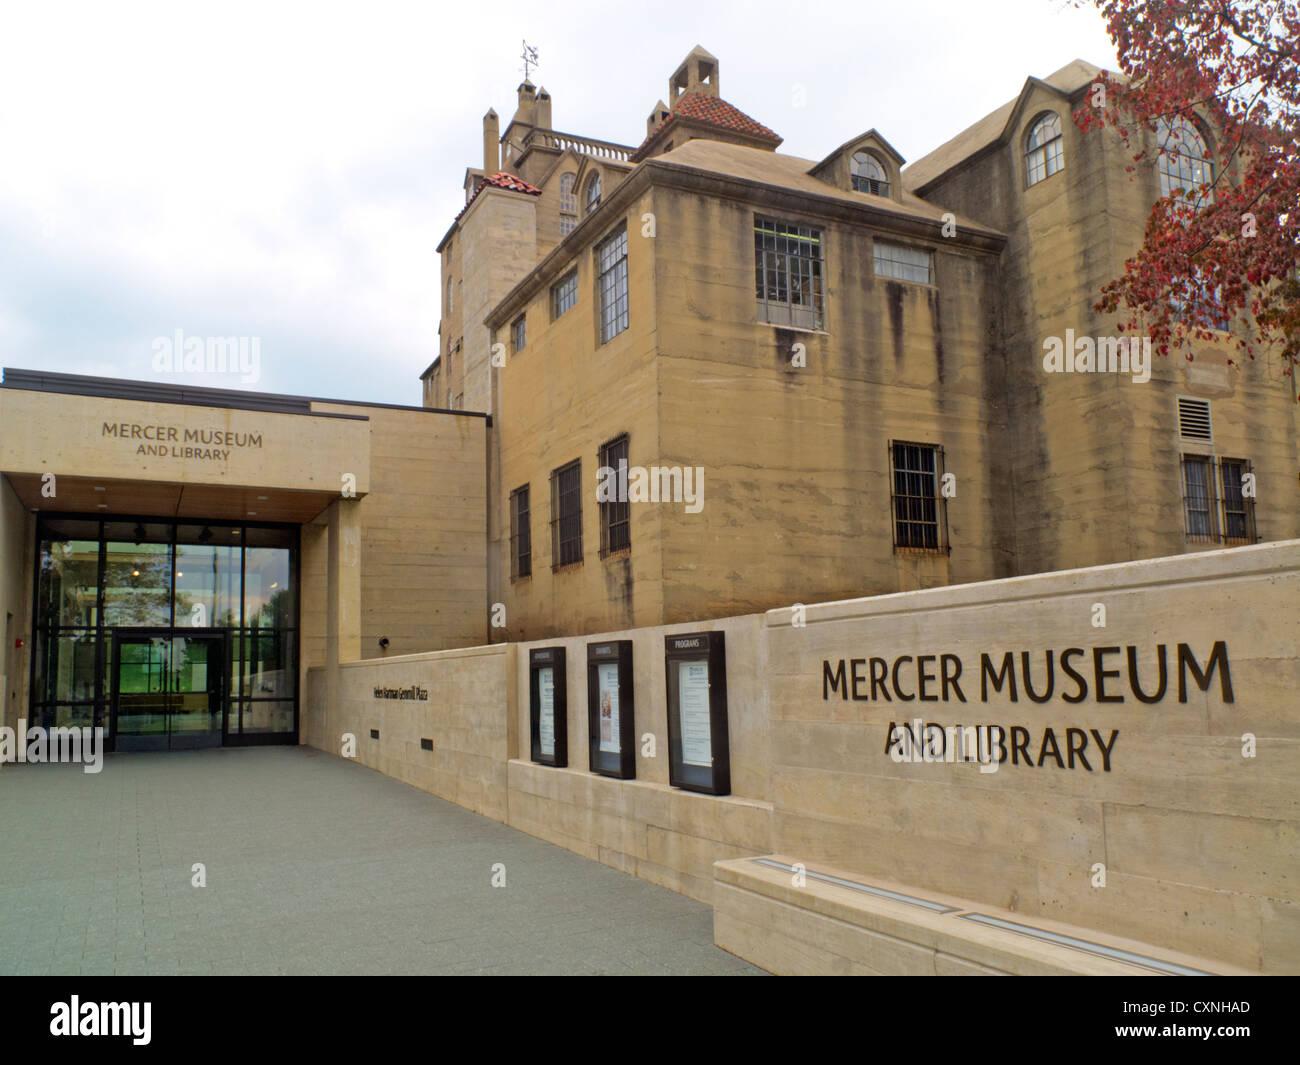 Mercer Library Stock Photos & Mercer Library Stock Images